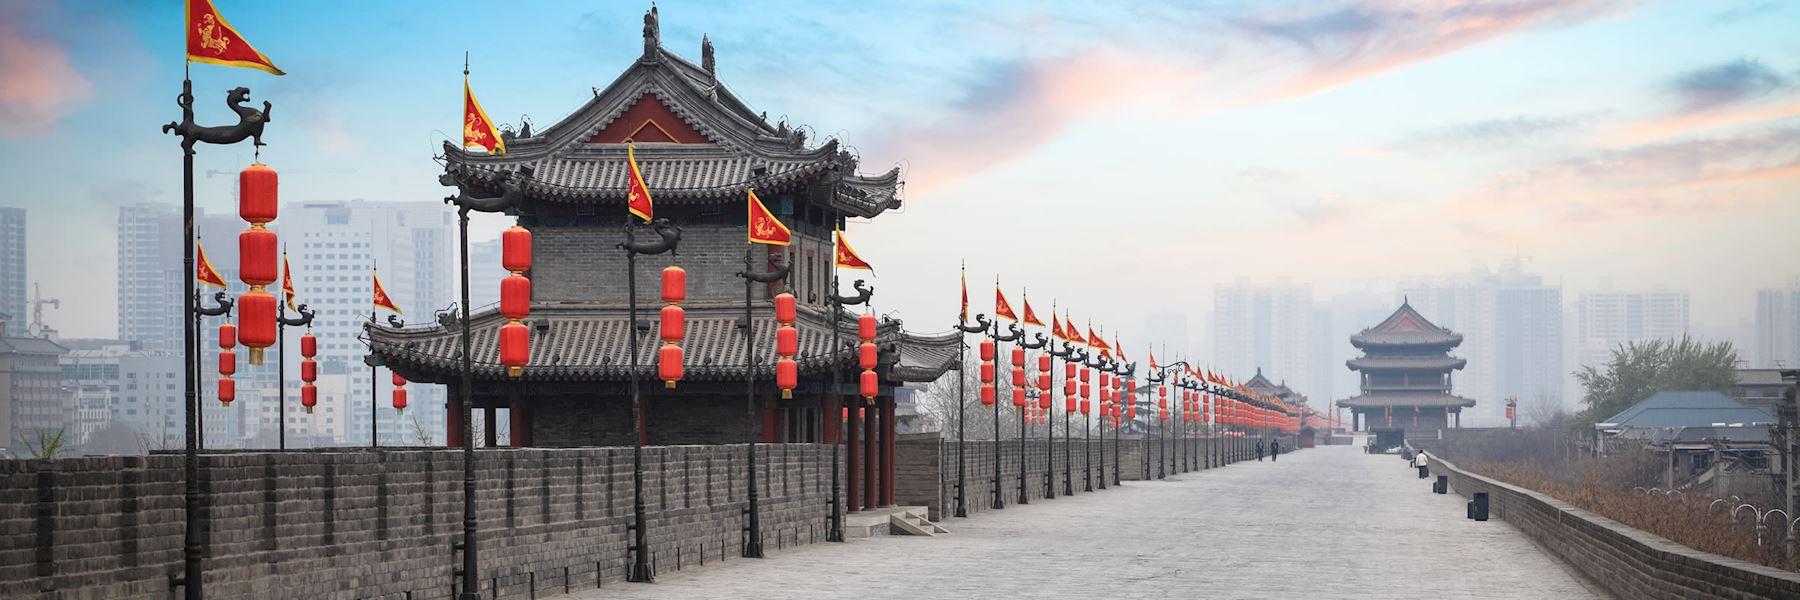 China trip ideas